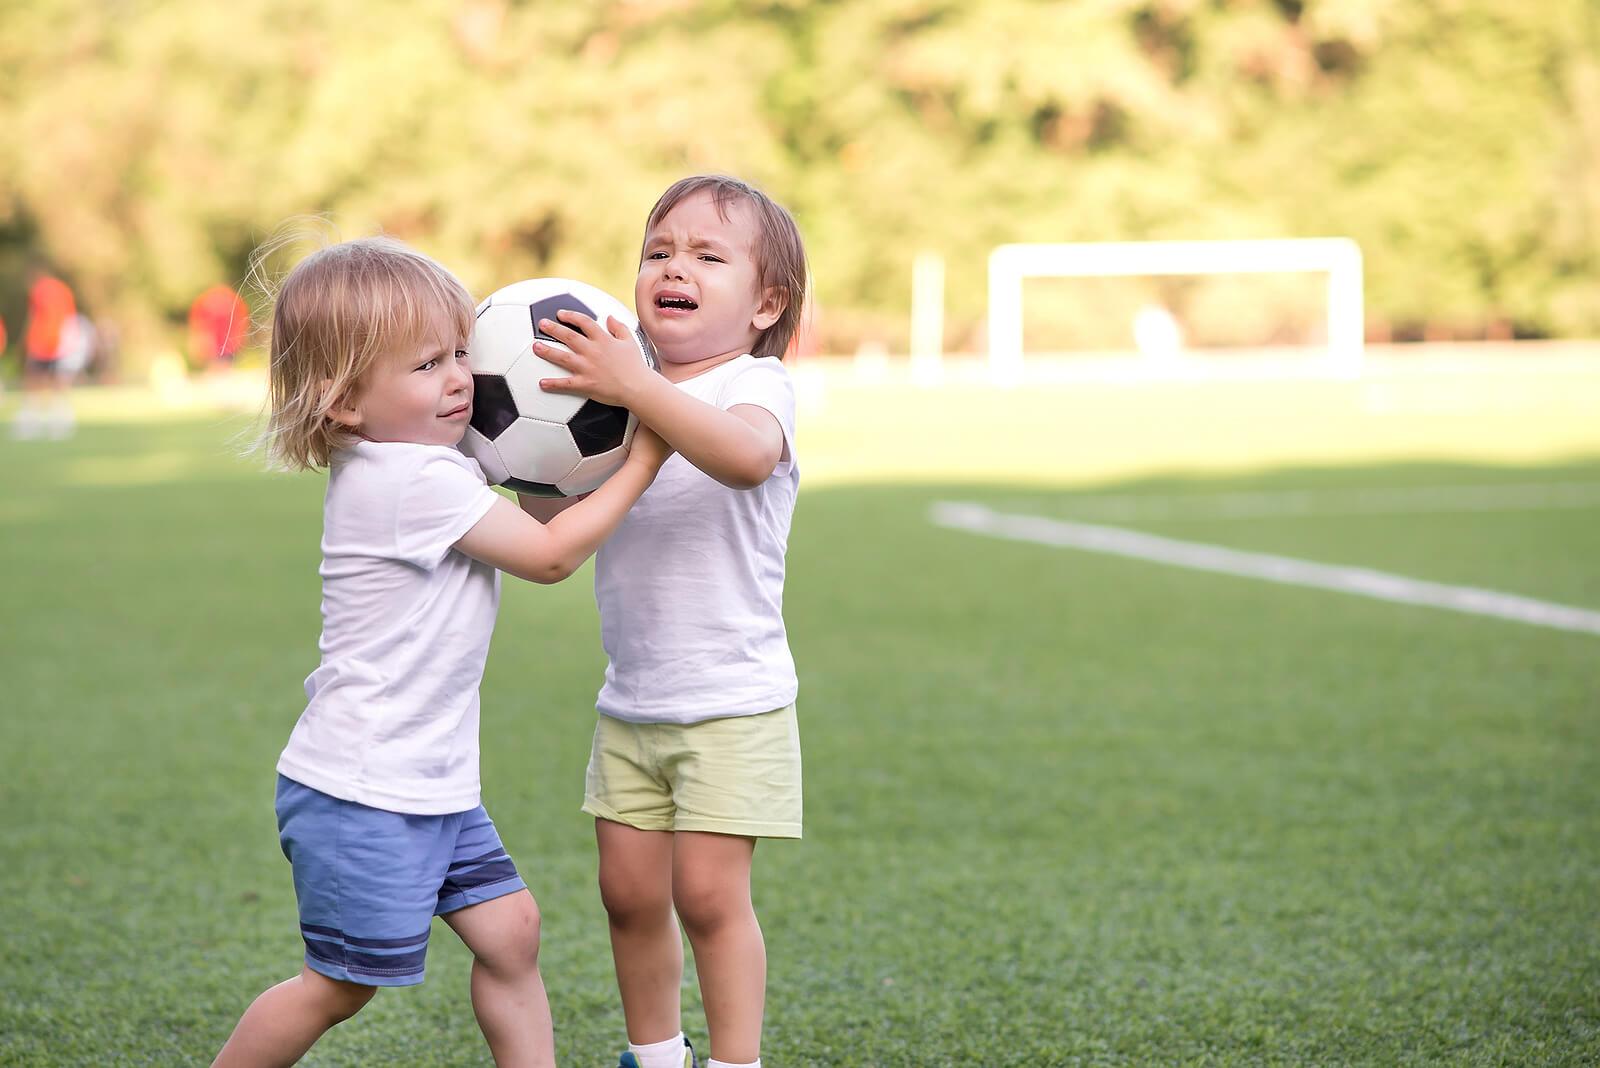 Niños peleando por un balón de fútbol.